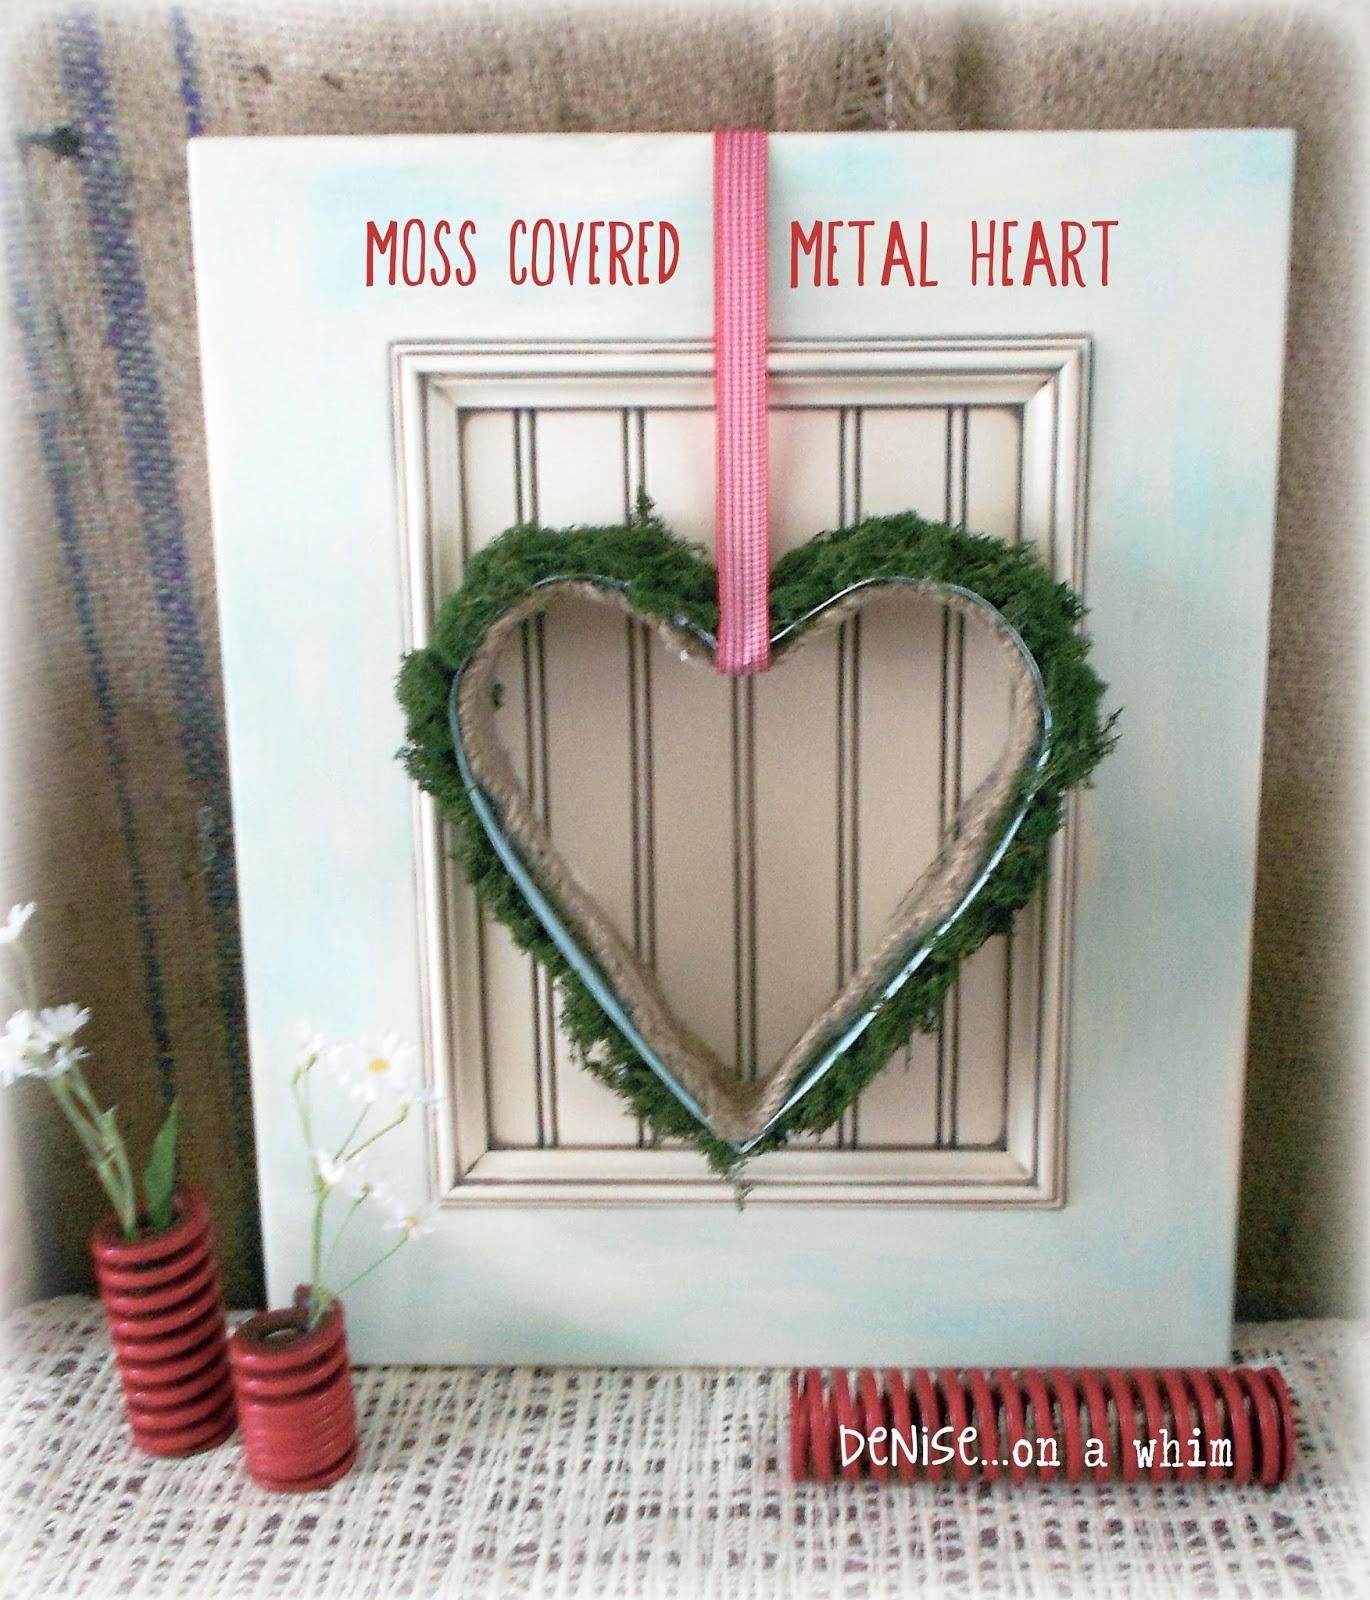 Metal Baking Form Heart Wall Decor via http://deniseonawhim.blogspot.com